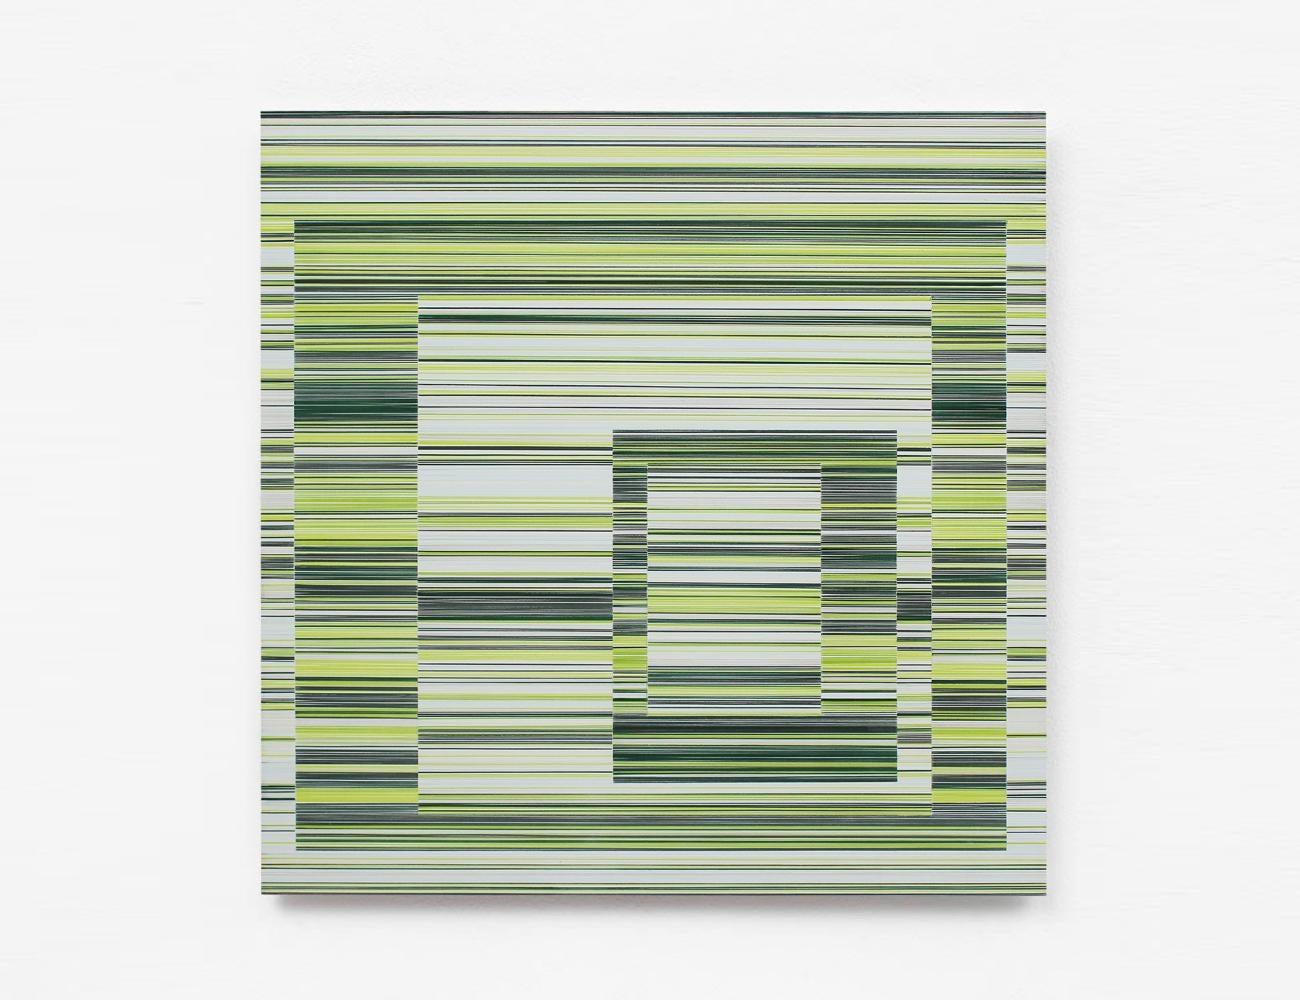 Layer No.16 by Doris Marten - Abstract painting, minimalist, green